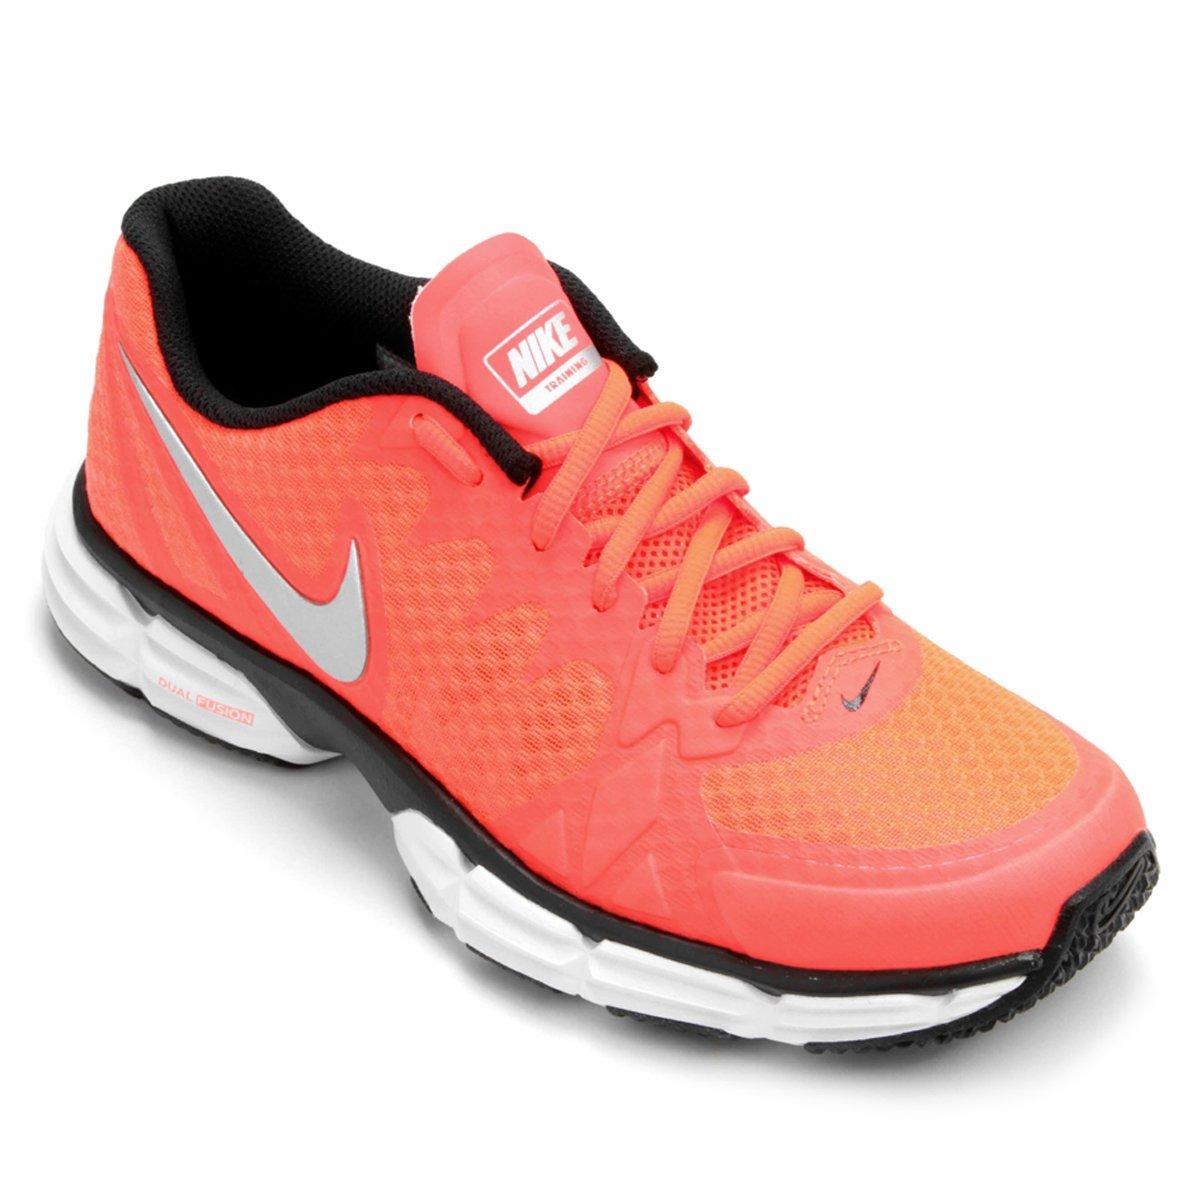 976d239570 Tênis Nike Dual Fusion TR 6 Masculino - Compre Agora